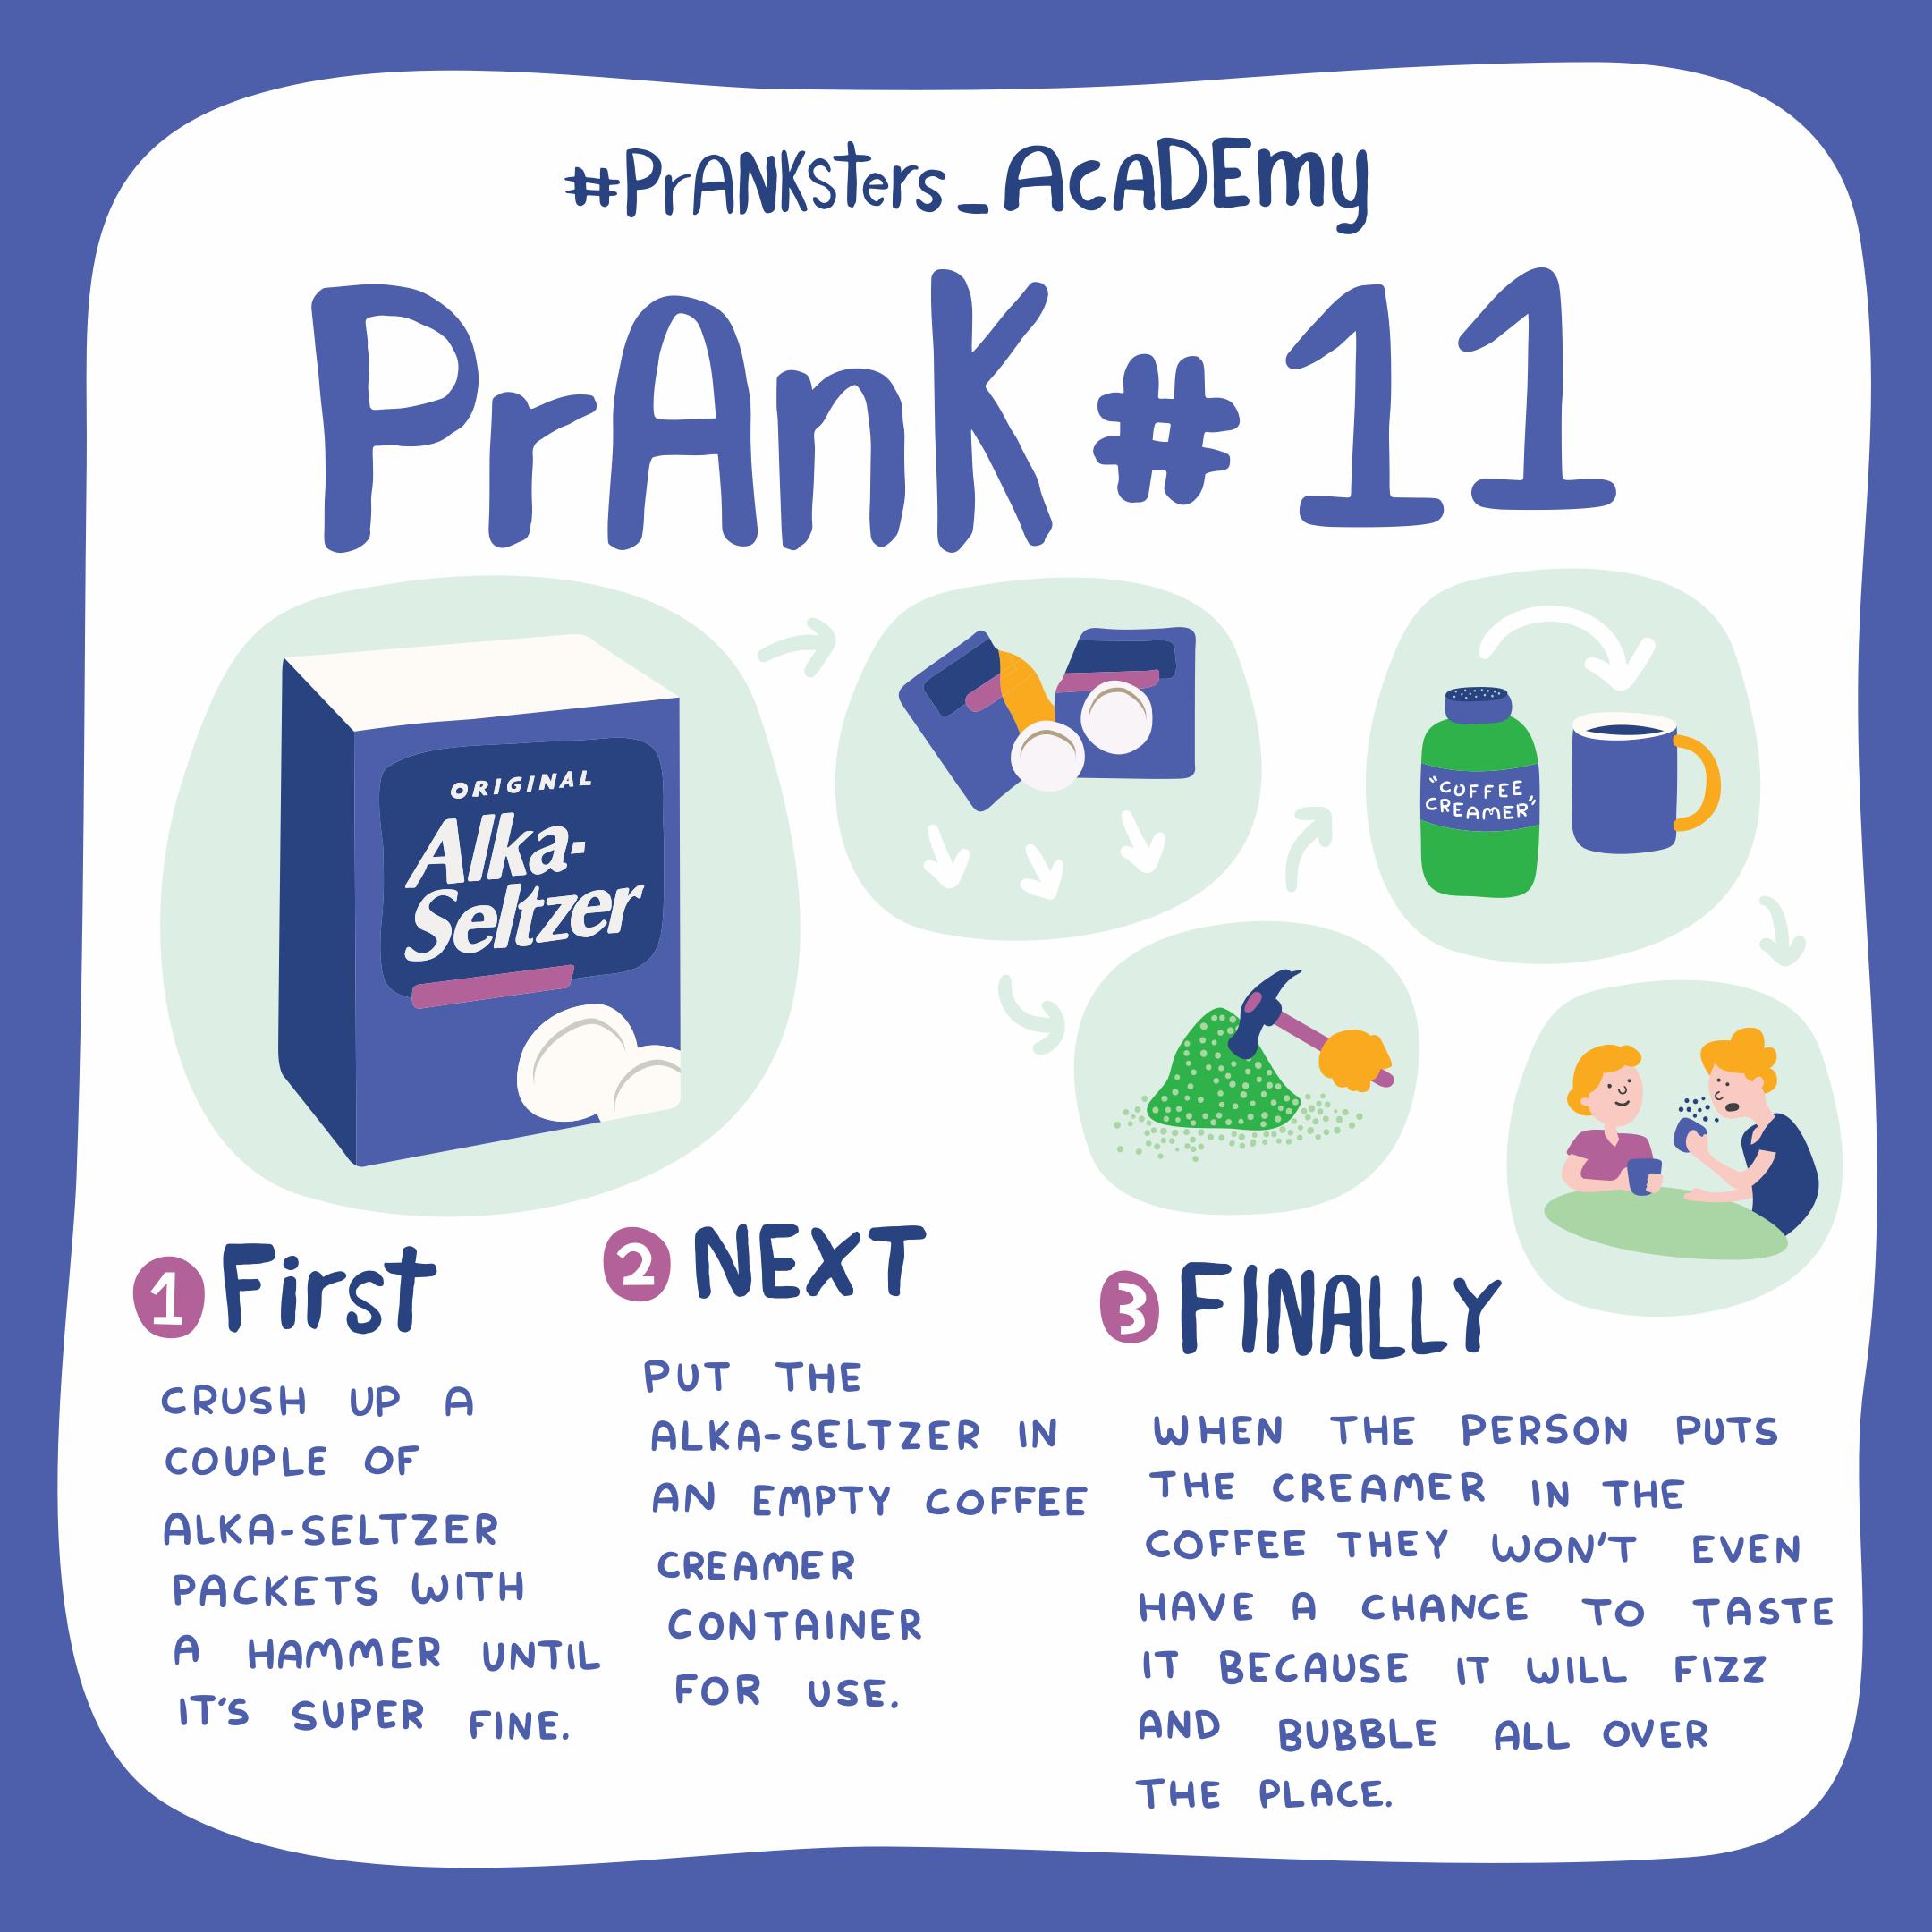 PRANK #11: ALKA-SELTZER COFFEE CREAMER